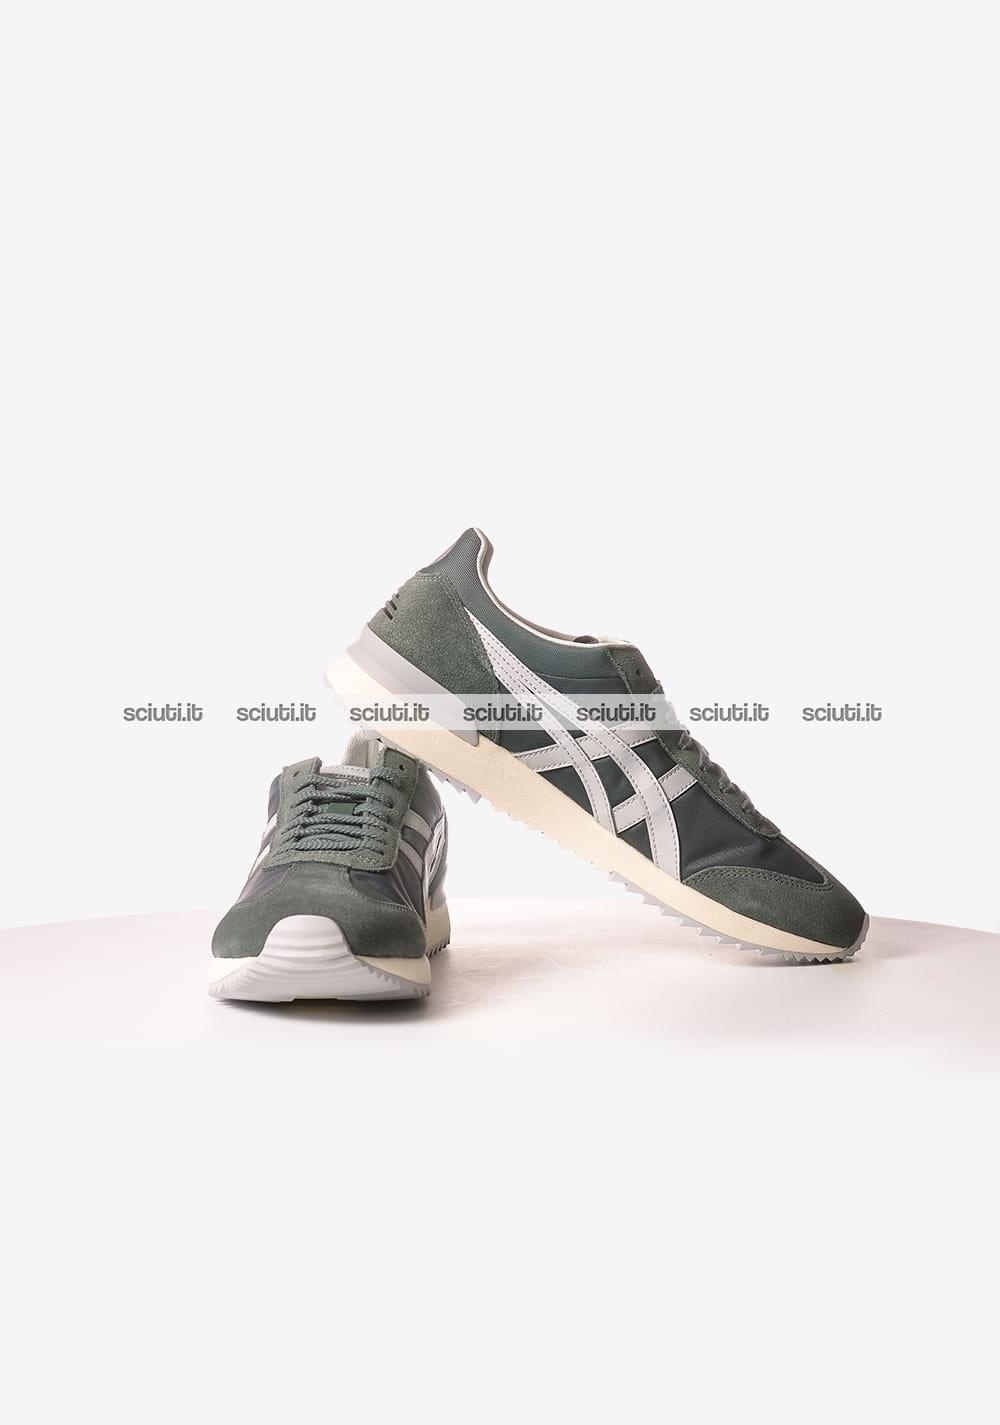 ONITSUKA TIGER Sneakers bambini grigio sesq8wtV